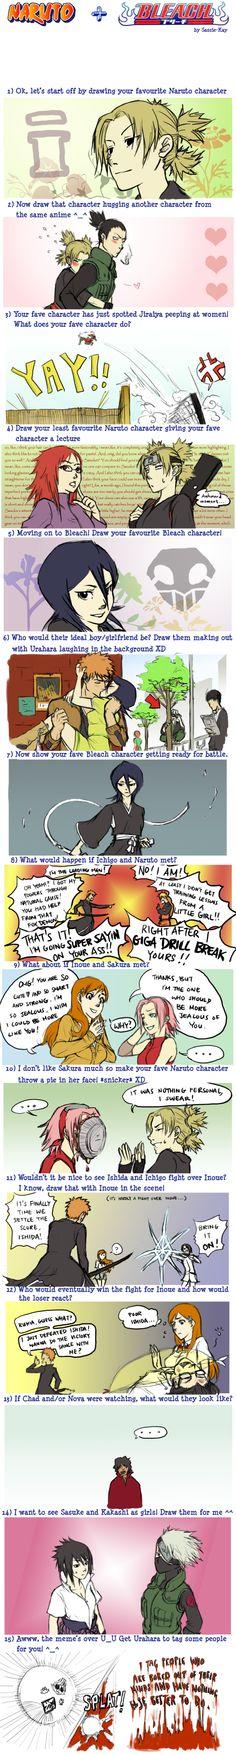 Naruto and Bleach